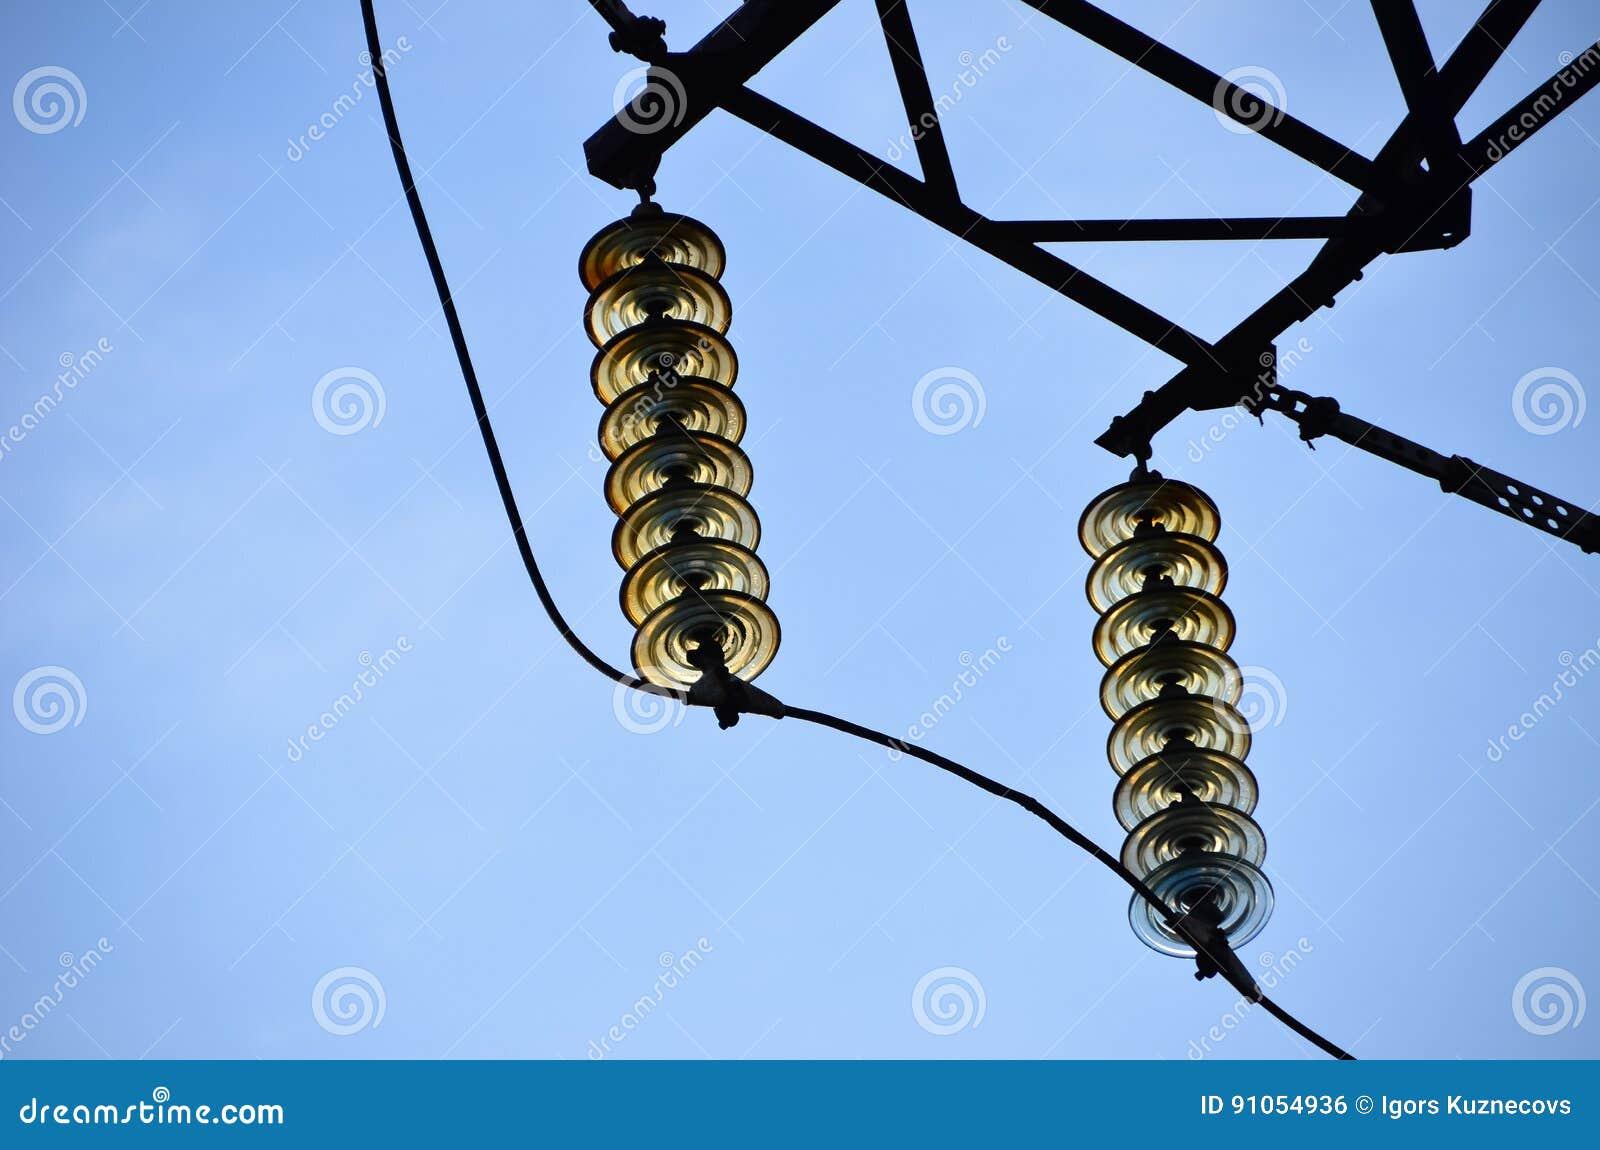 Transmission Line Insulators Stock Photo Image Of Transformer Transmission 91054936